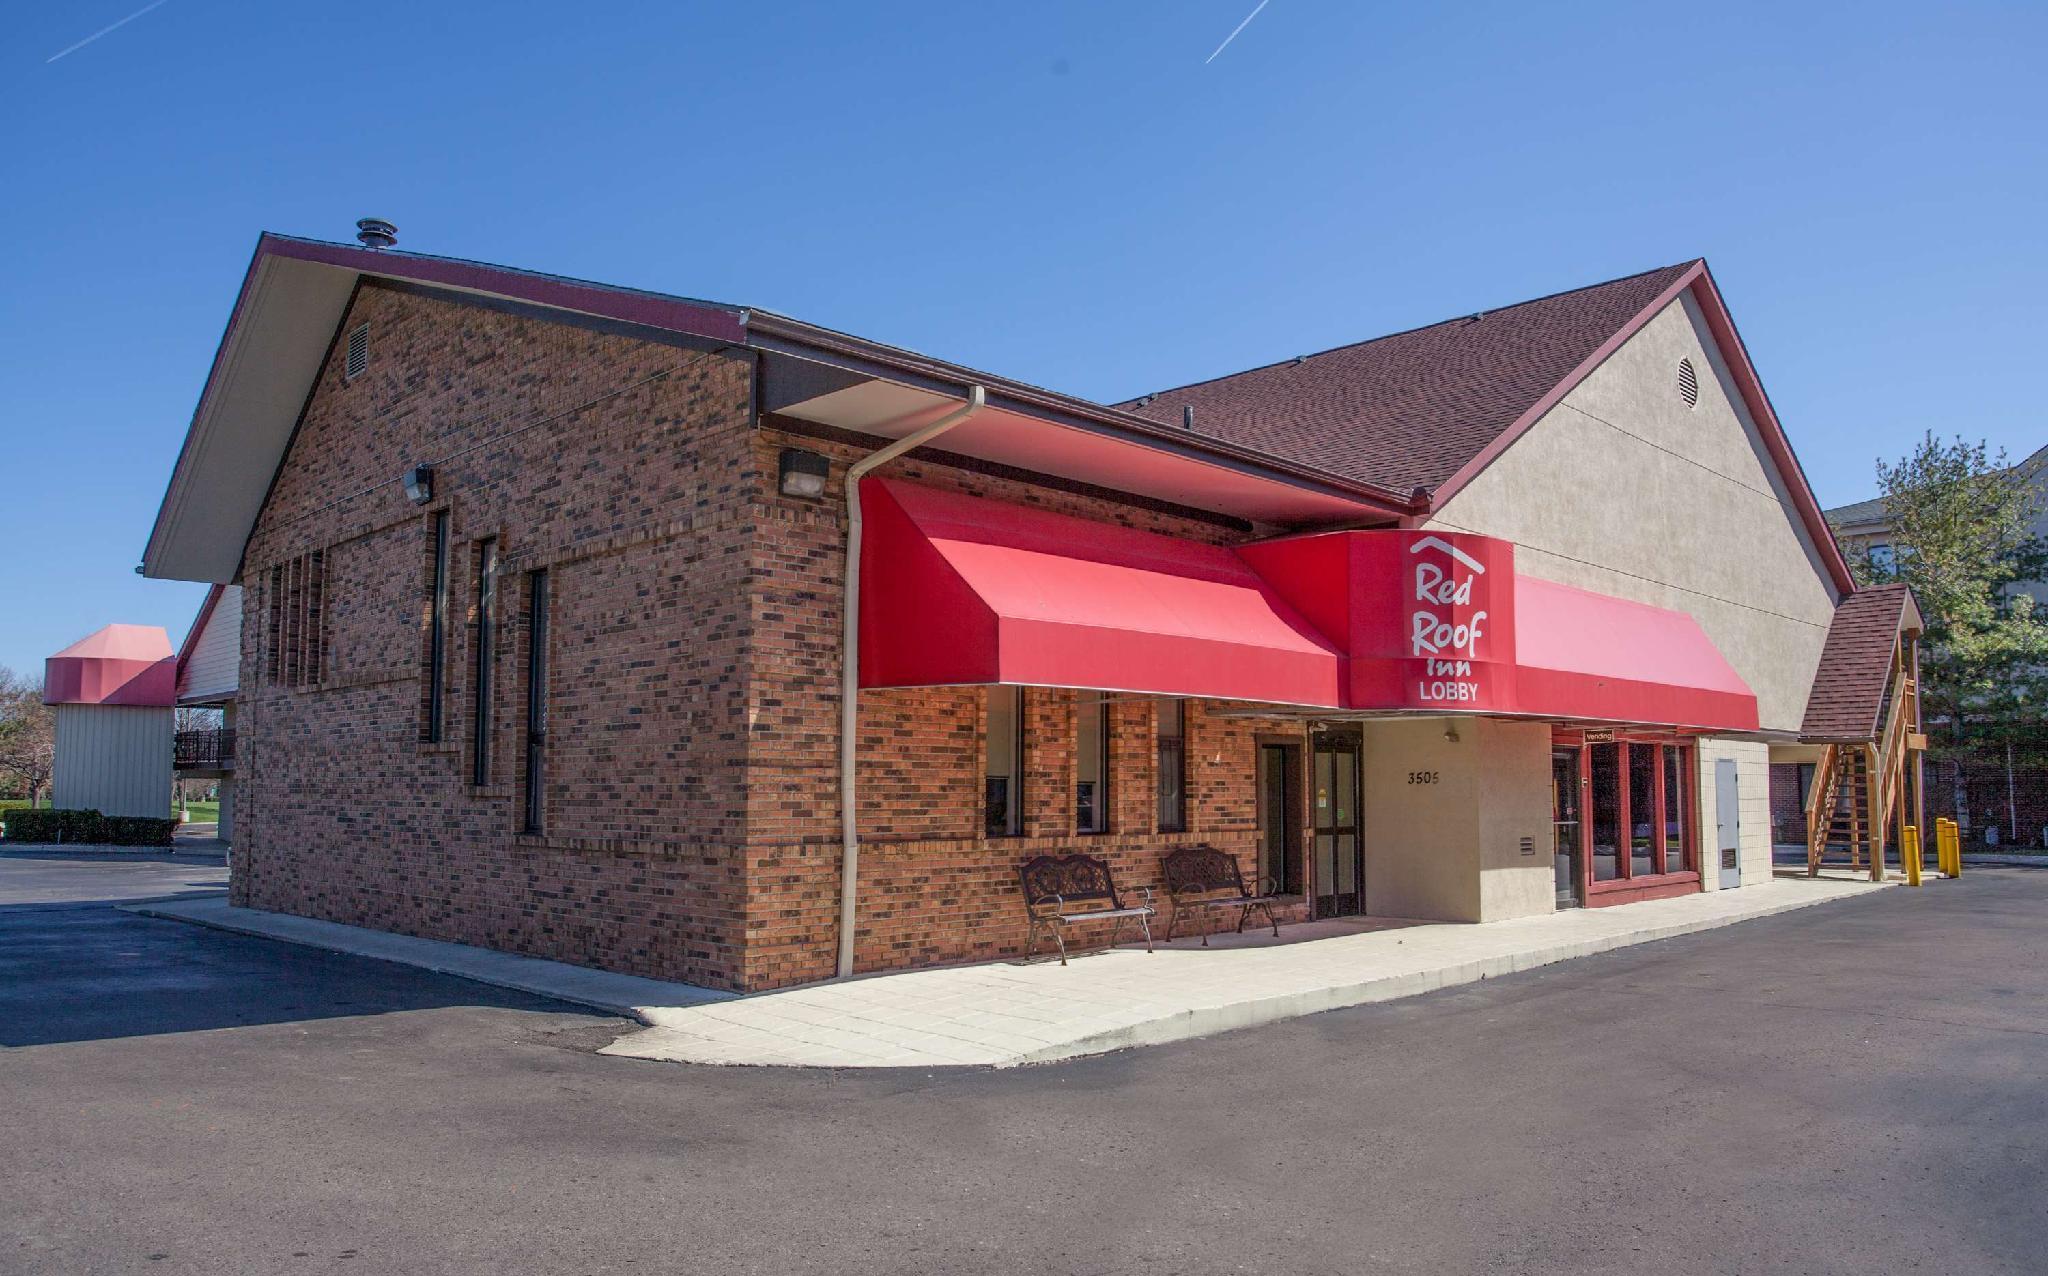 Red Roof Inn Ann Arbor   U Of Michigan South